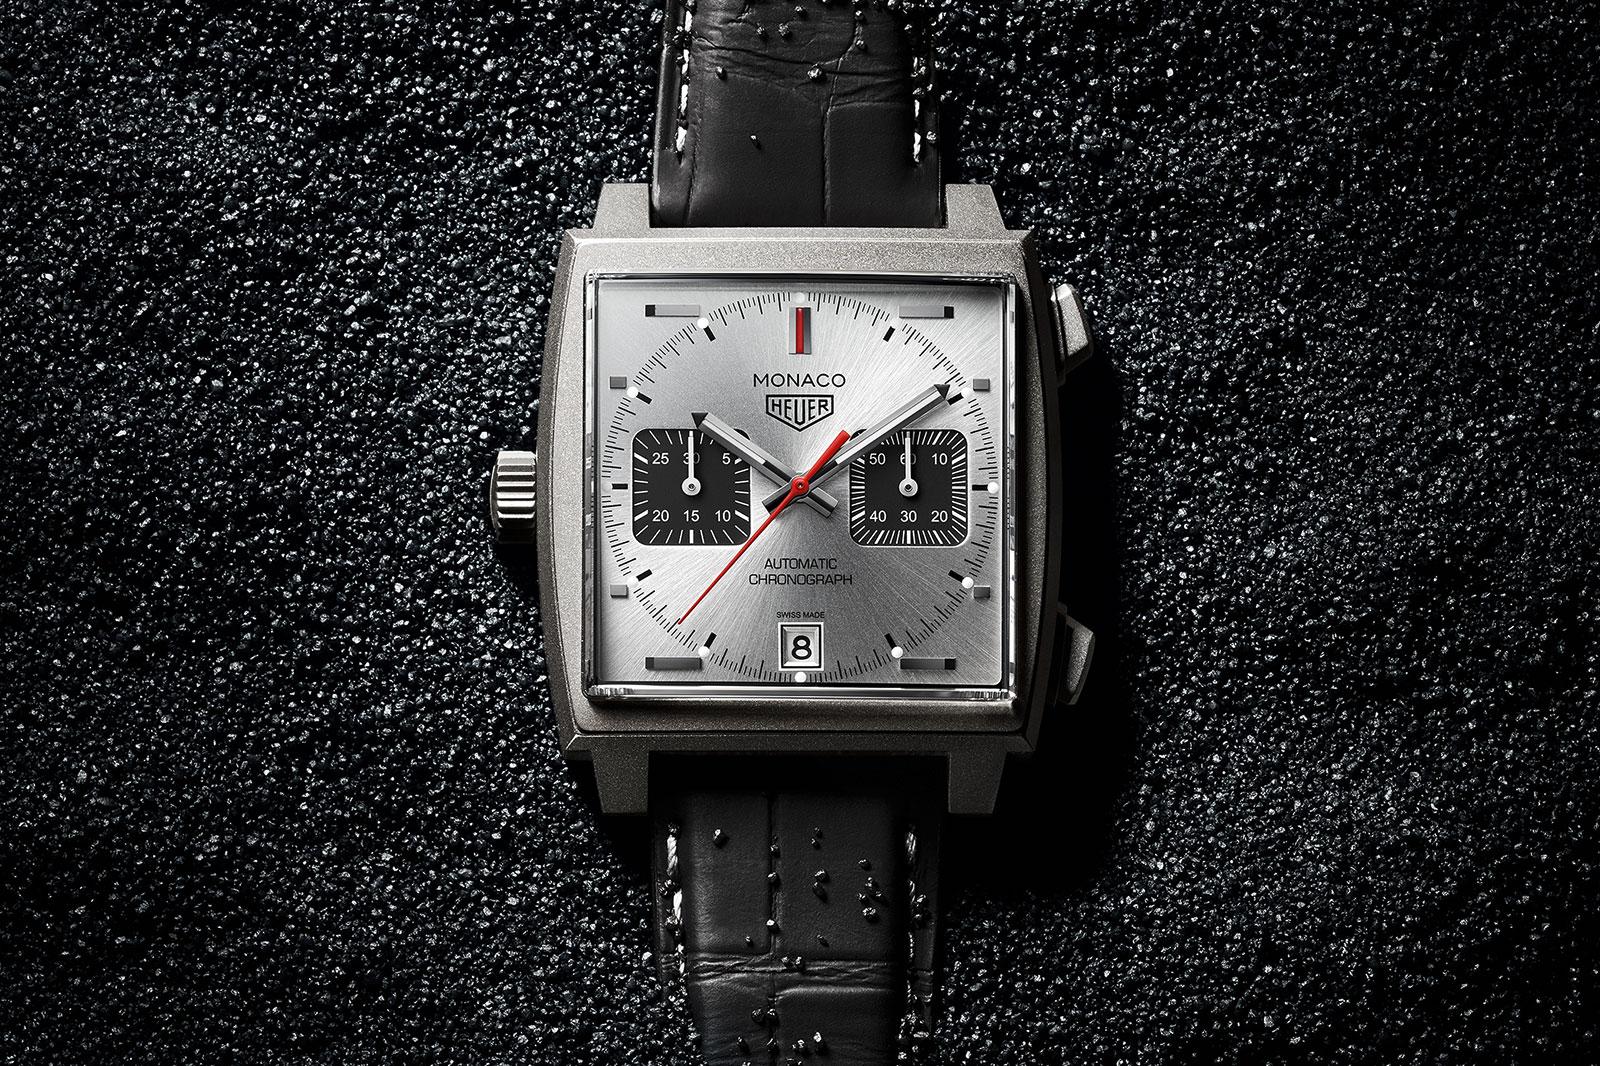 TAG Heuer Monaco Titan Replica Watch with folding clasp